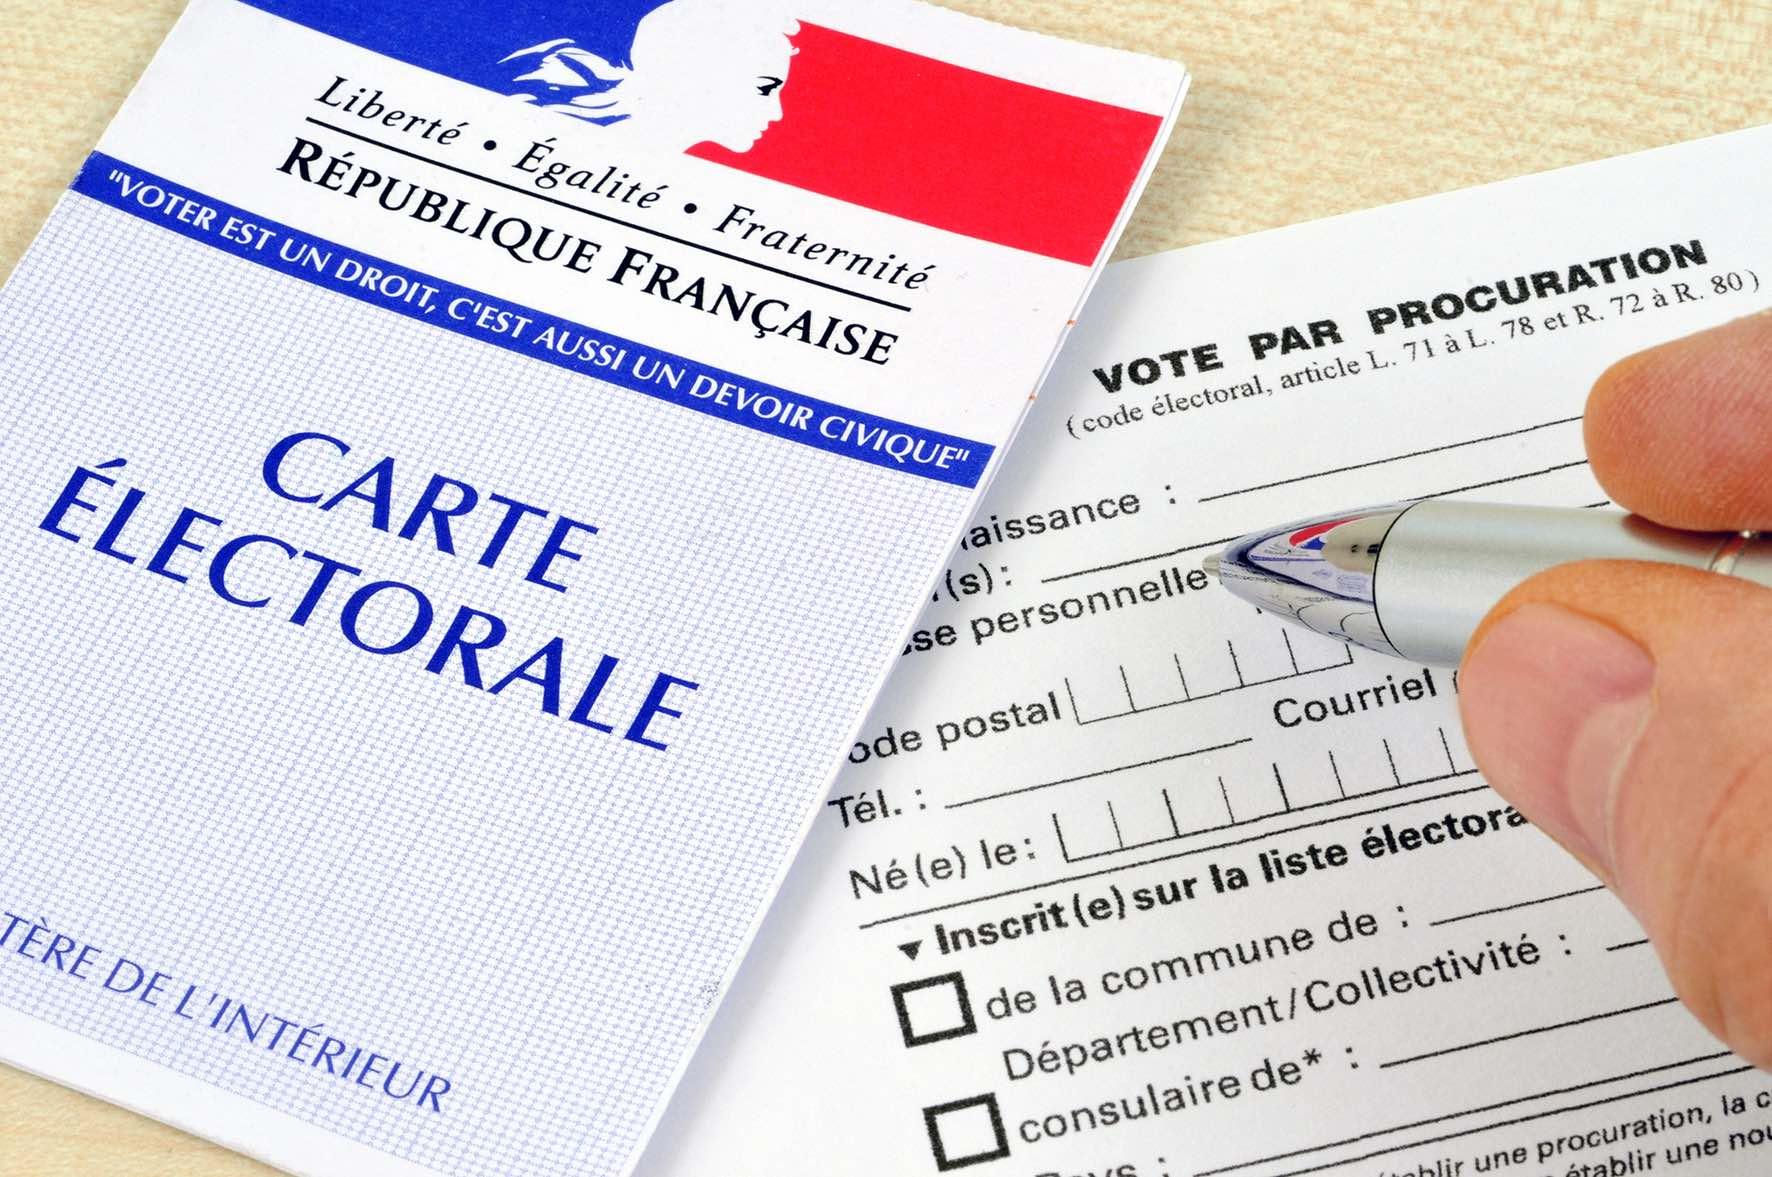 Vote-procuration.jpg